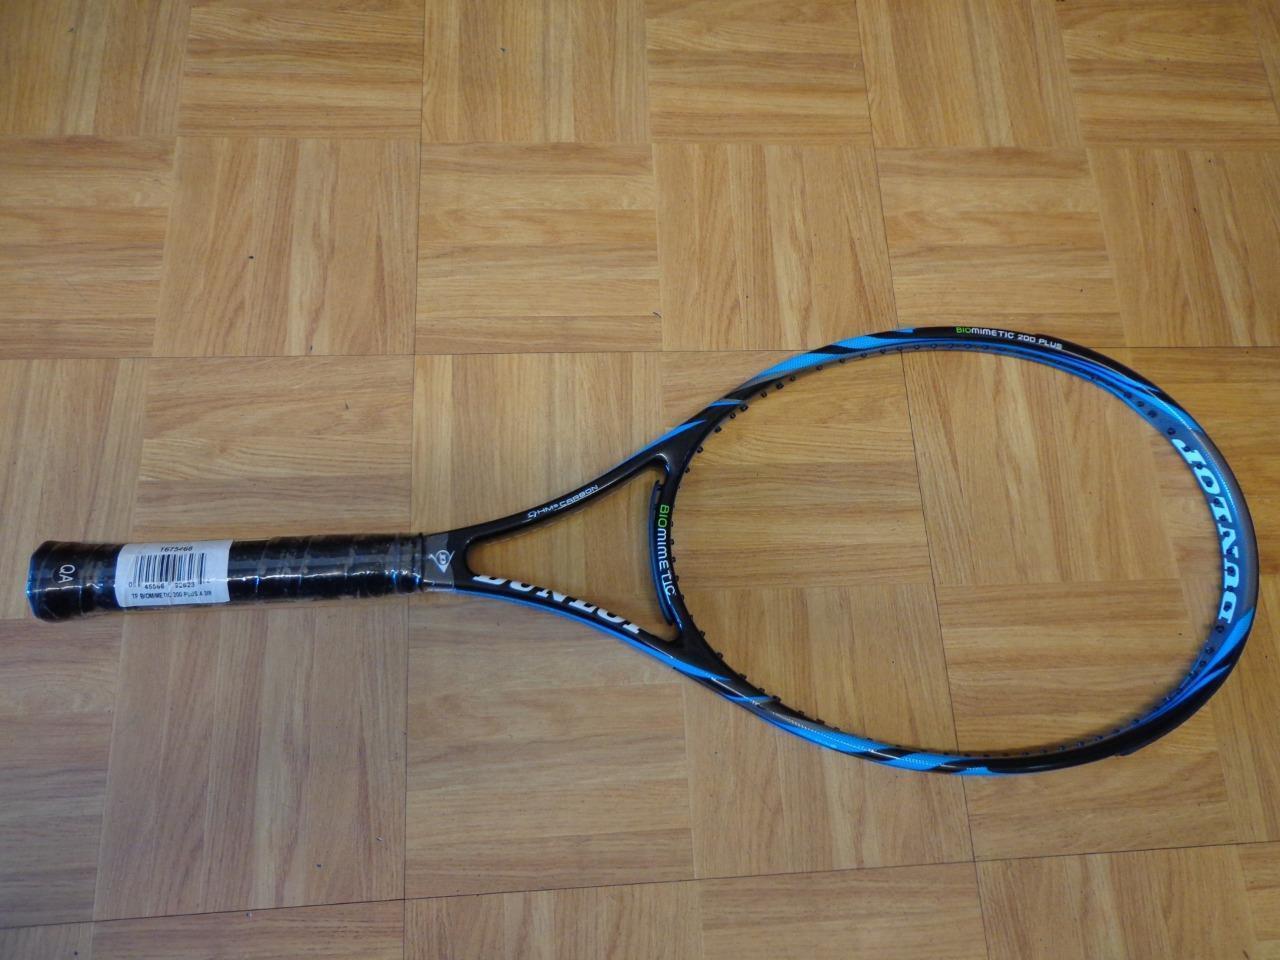 NEW Dunlop Biomimetic 200 PLUS 100 head size 18x20 4 1 4 grip Tennis Racquet